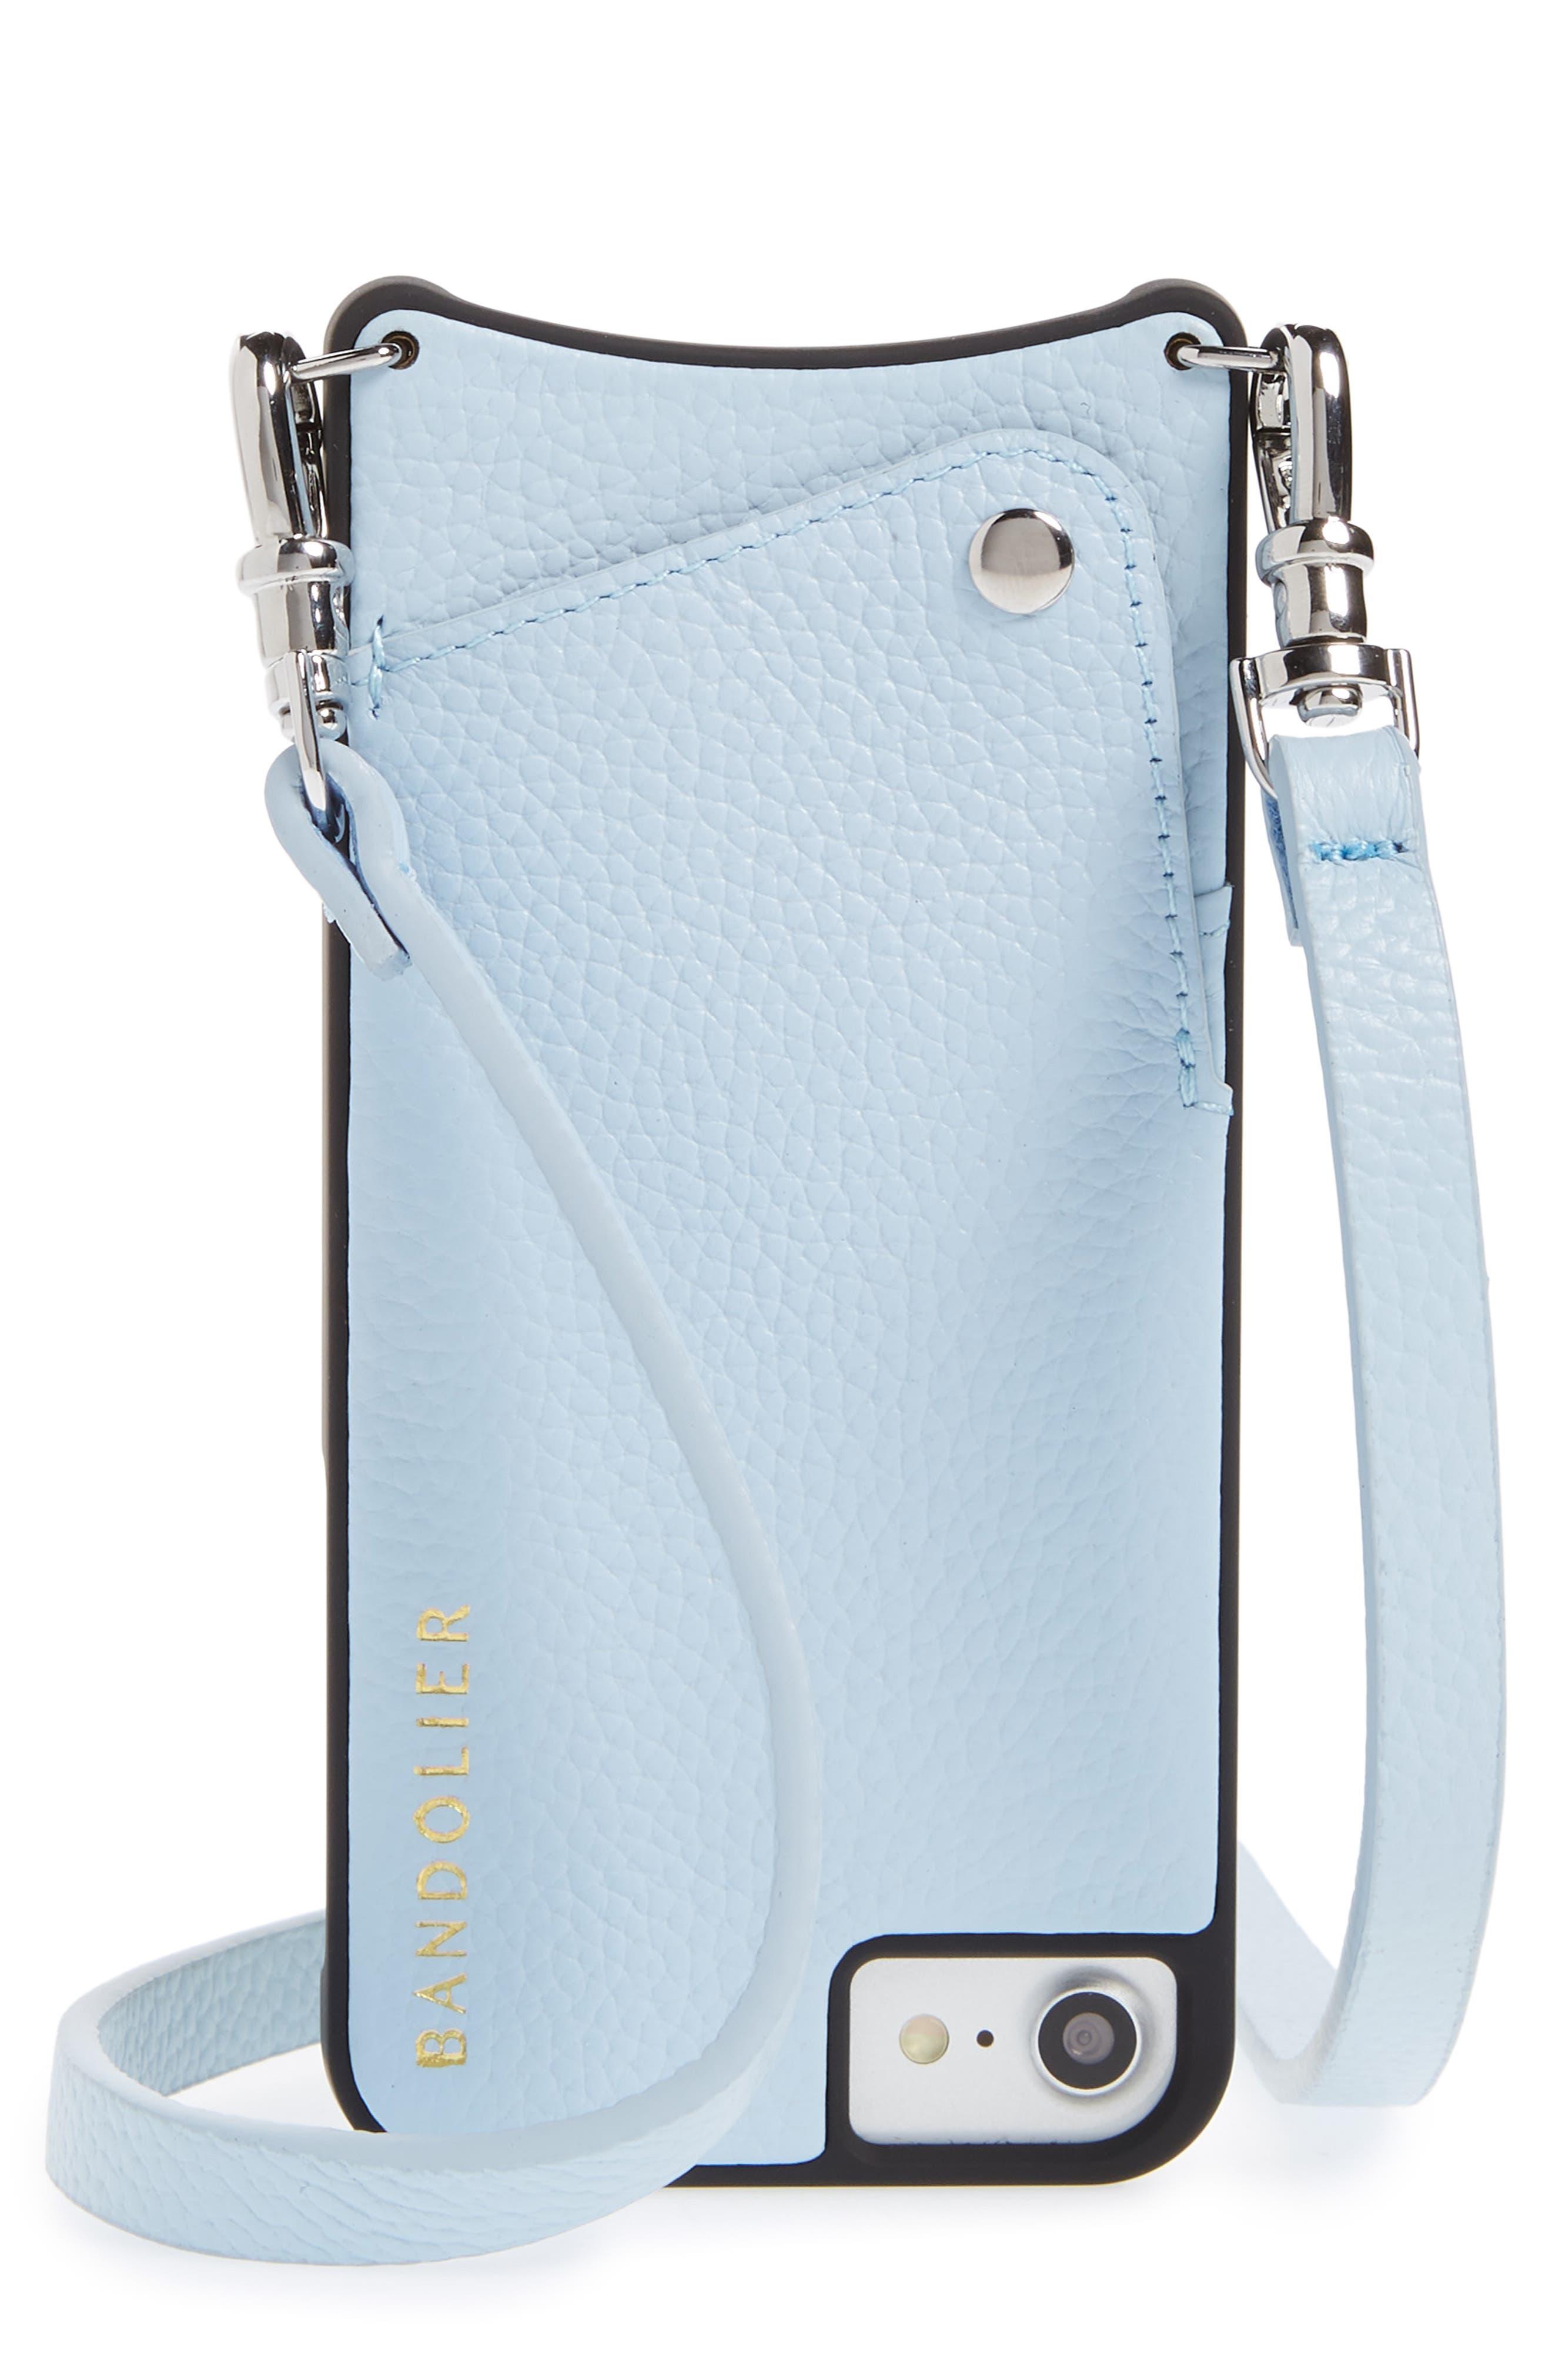 Emma Leather iPhone 6/7/8 & 6/7/8 Plus Crossbody Case,                         Main,                         color, Light Blue/ Silver